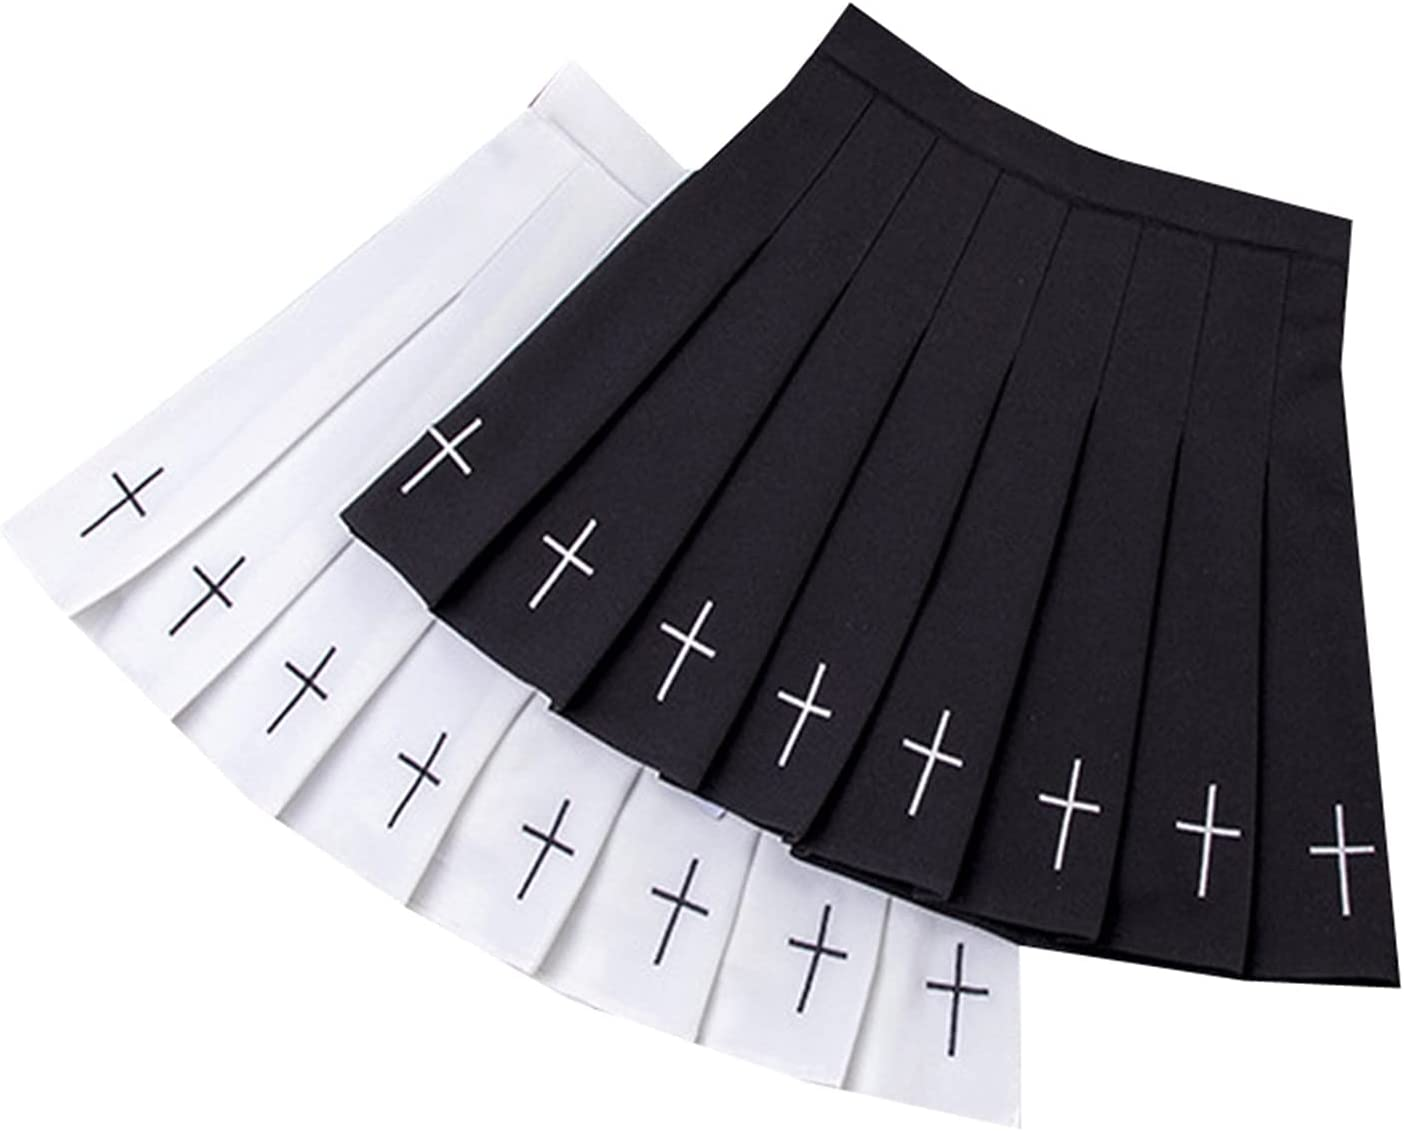 LSXLSD Fashion Women Pleated Skirt High Waist Woman Mini Skirts Summer Harajuku Female Short Skirts Casual A-Line Ladies Dance Skirt (Color : Black5, Size : XX-Large)